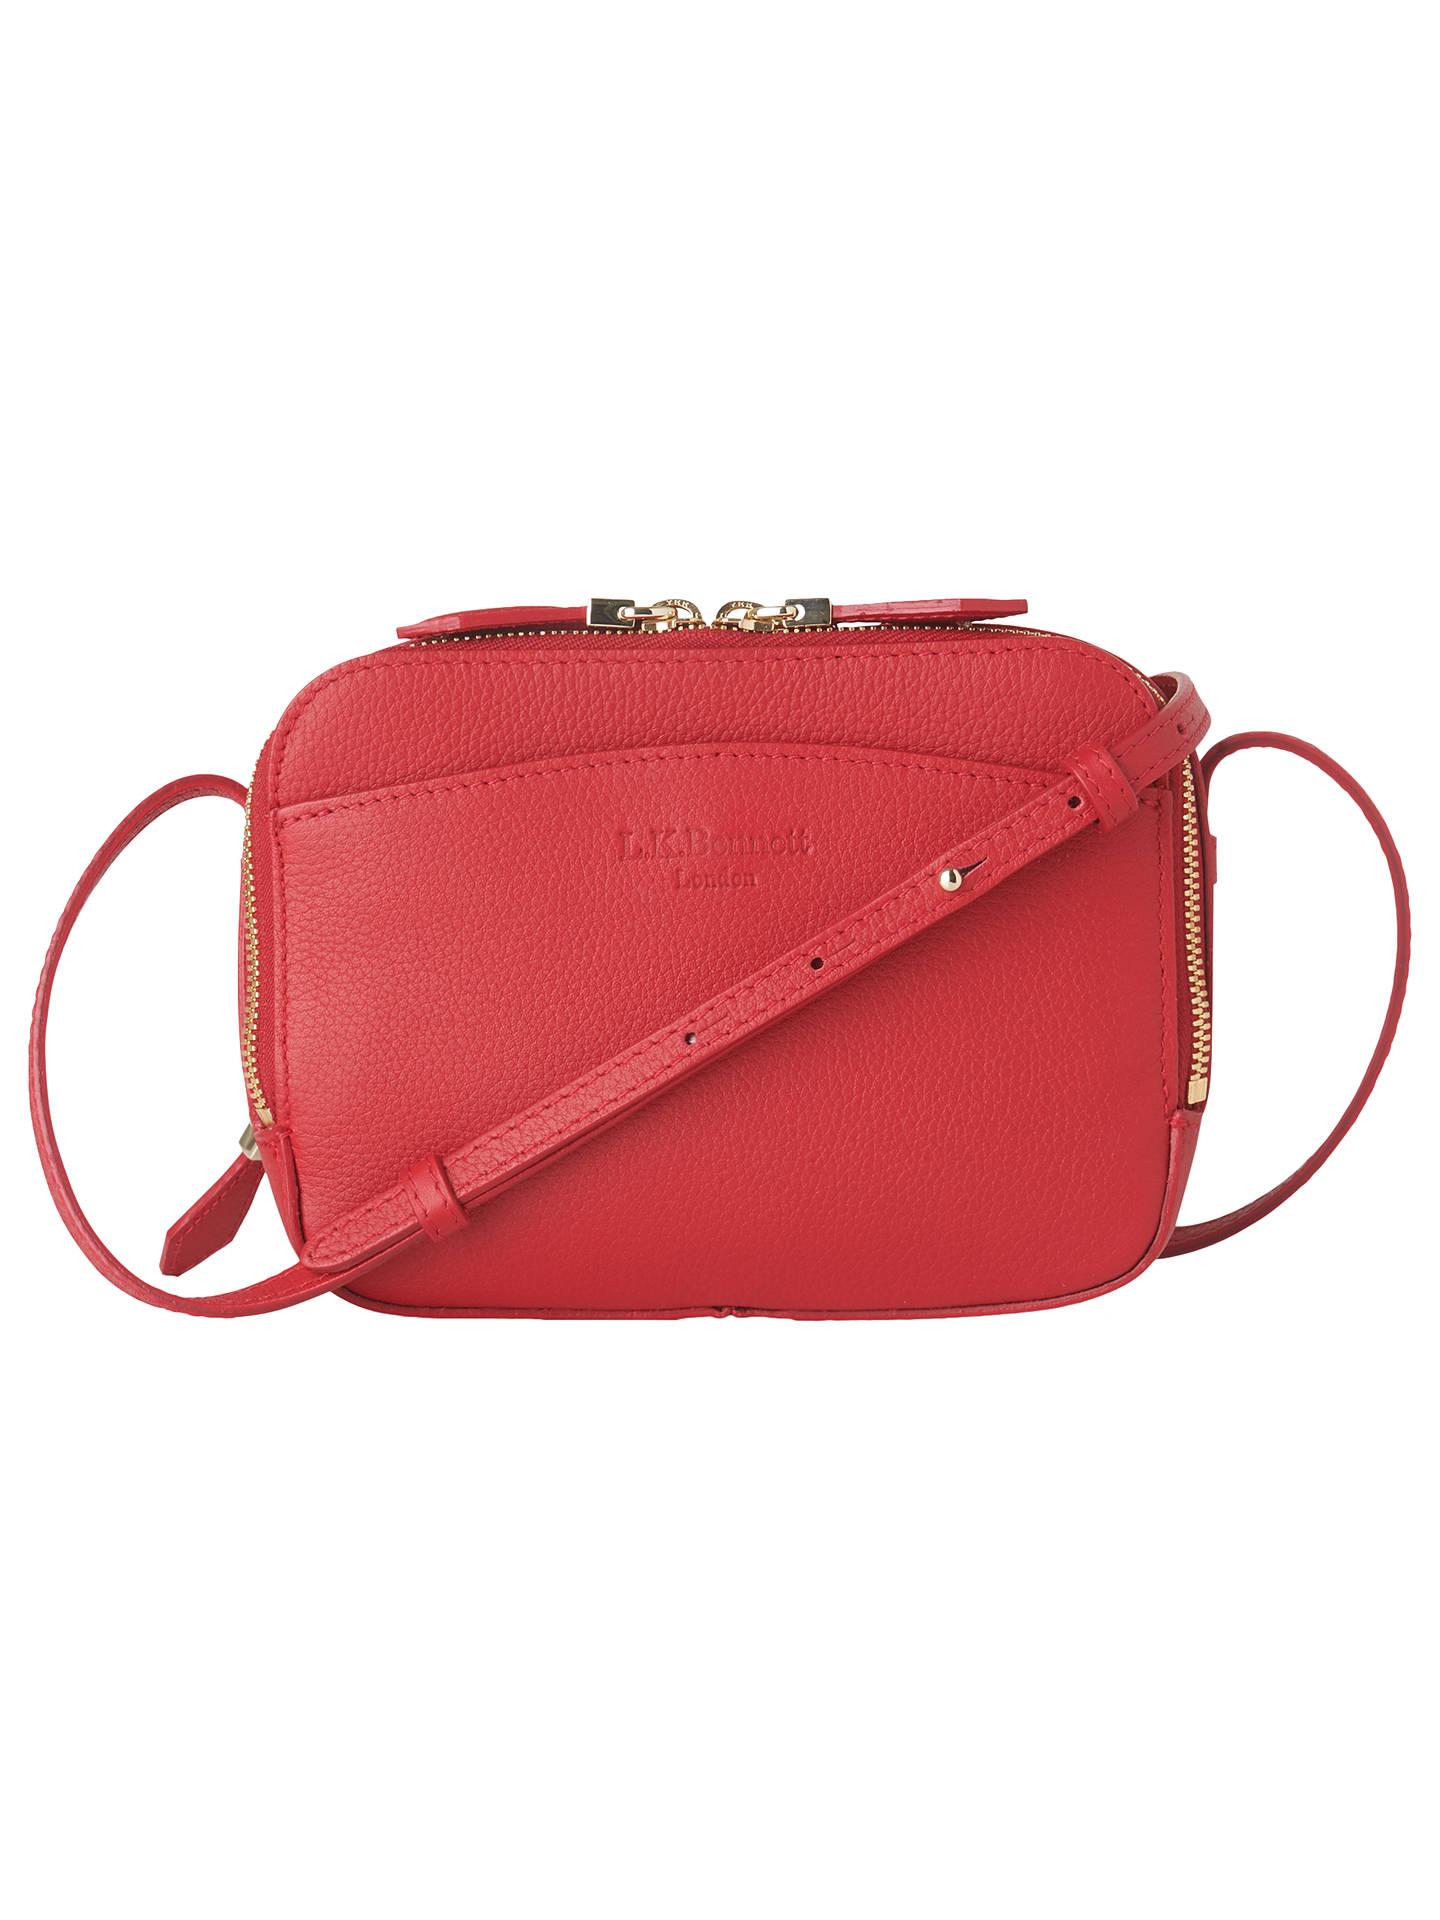 01d59c7920b6 Buy L.K.Bennett Mariel Leather Cross Body Bag, Red Online at johnlewis.com  ...